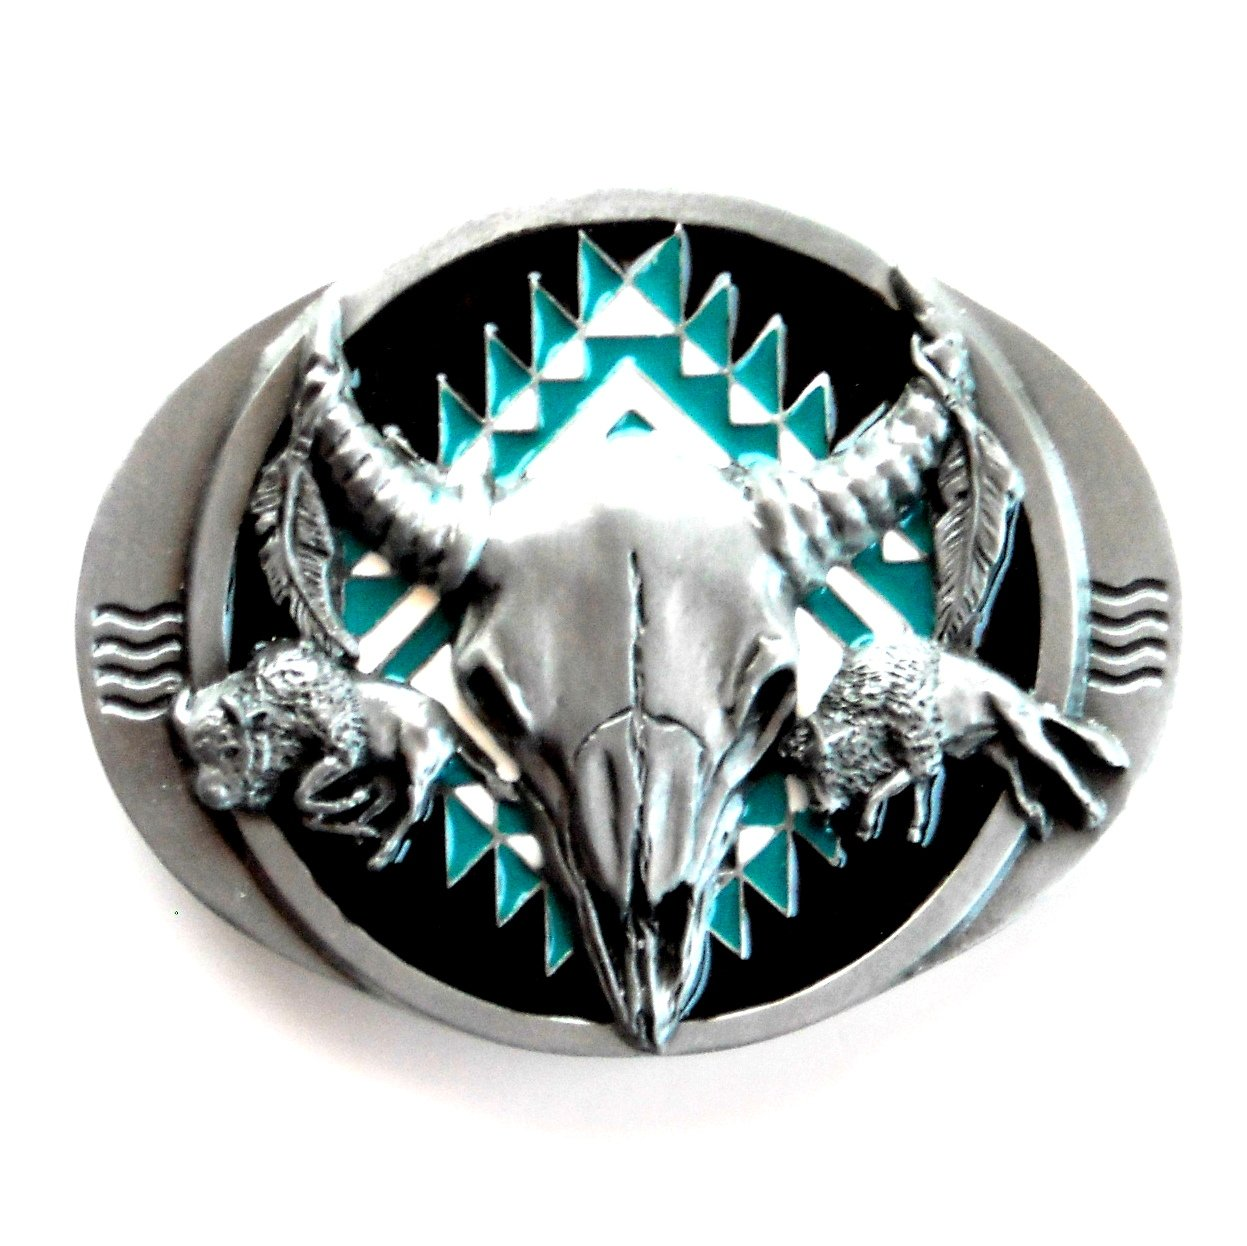 Native Buffalo Skull Turquoise Black 3D Siskiyou Pewter Belt Buckle